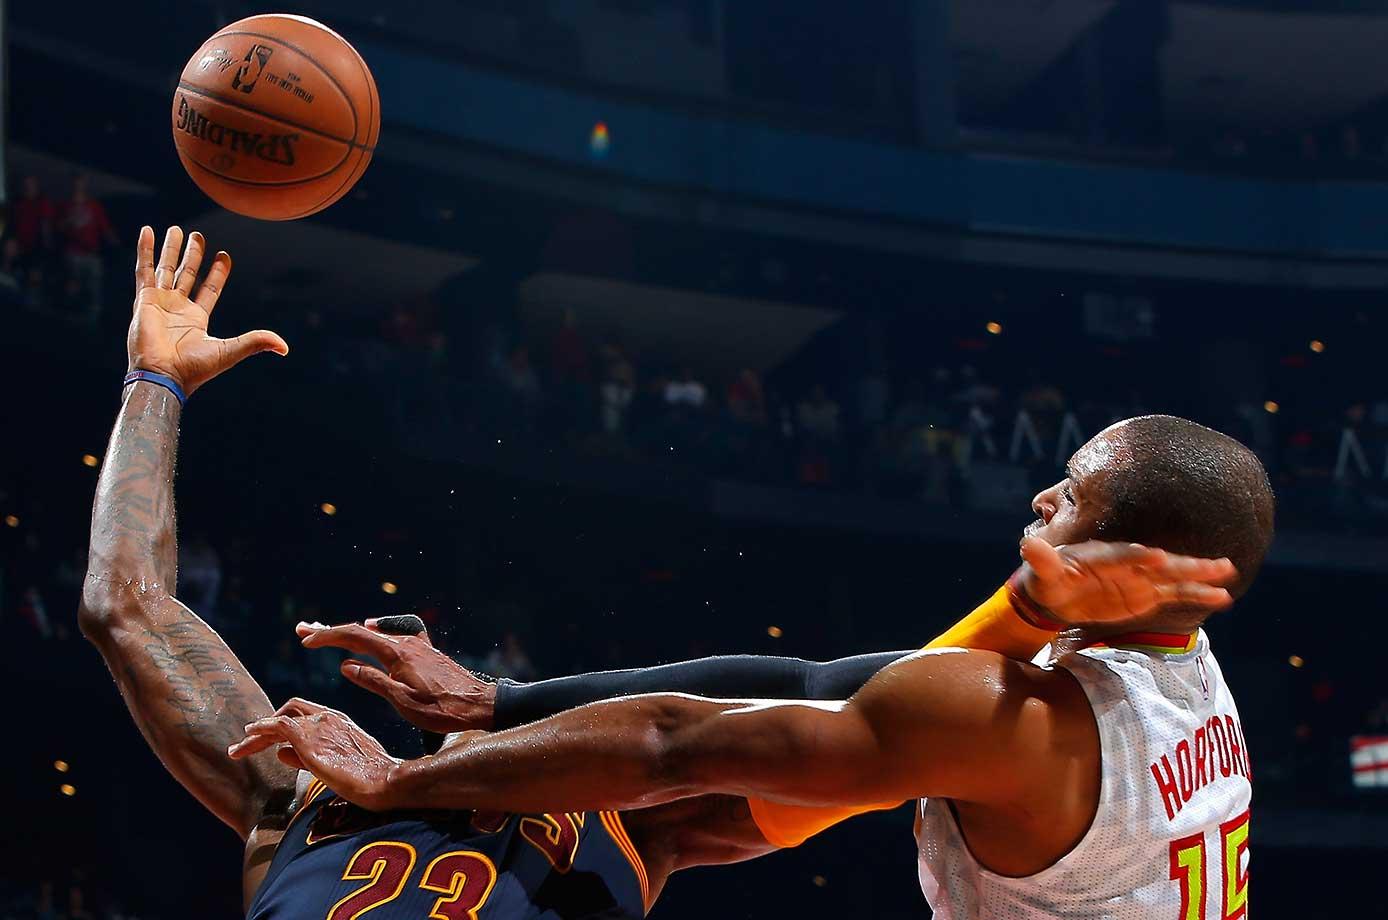 Al Horford of the Atlanta Hawks seemingly makes LeBron James lose his head on a hard foul.